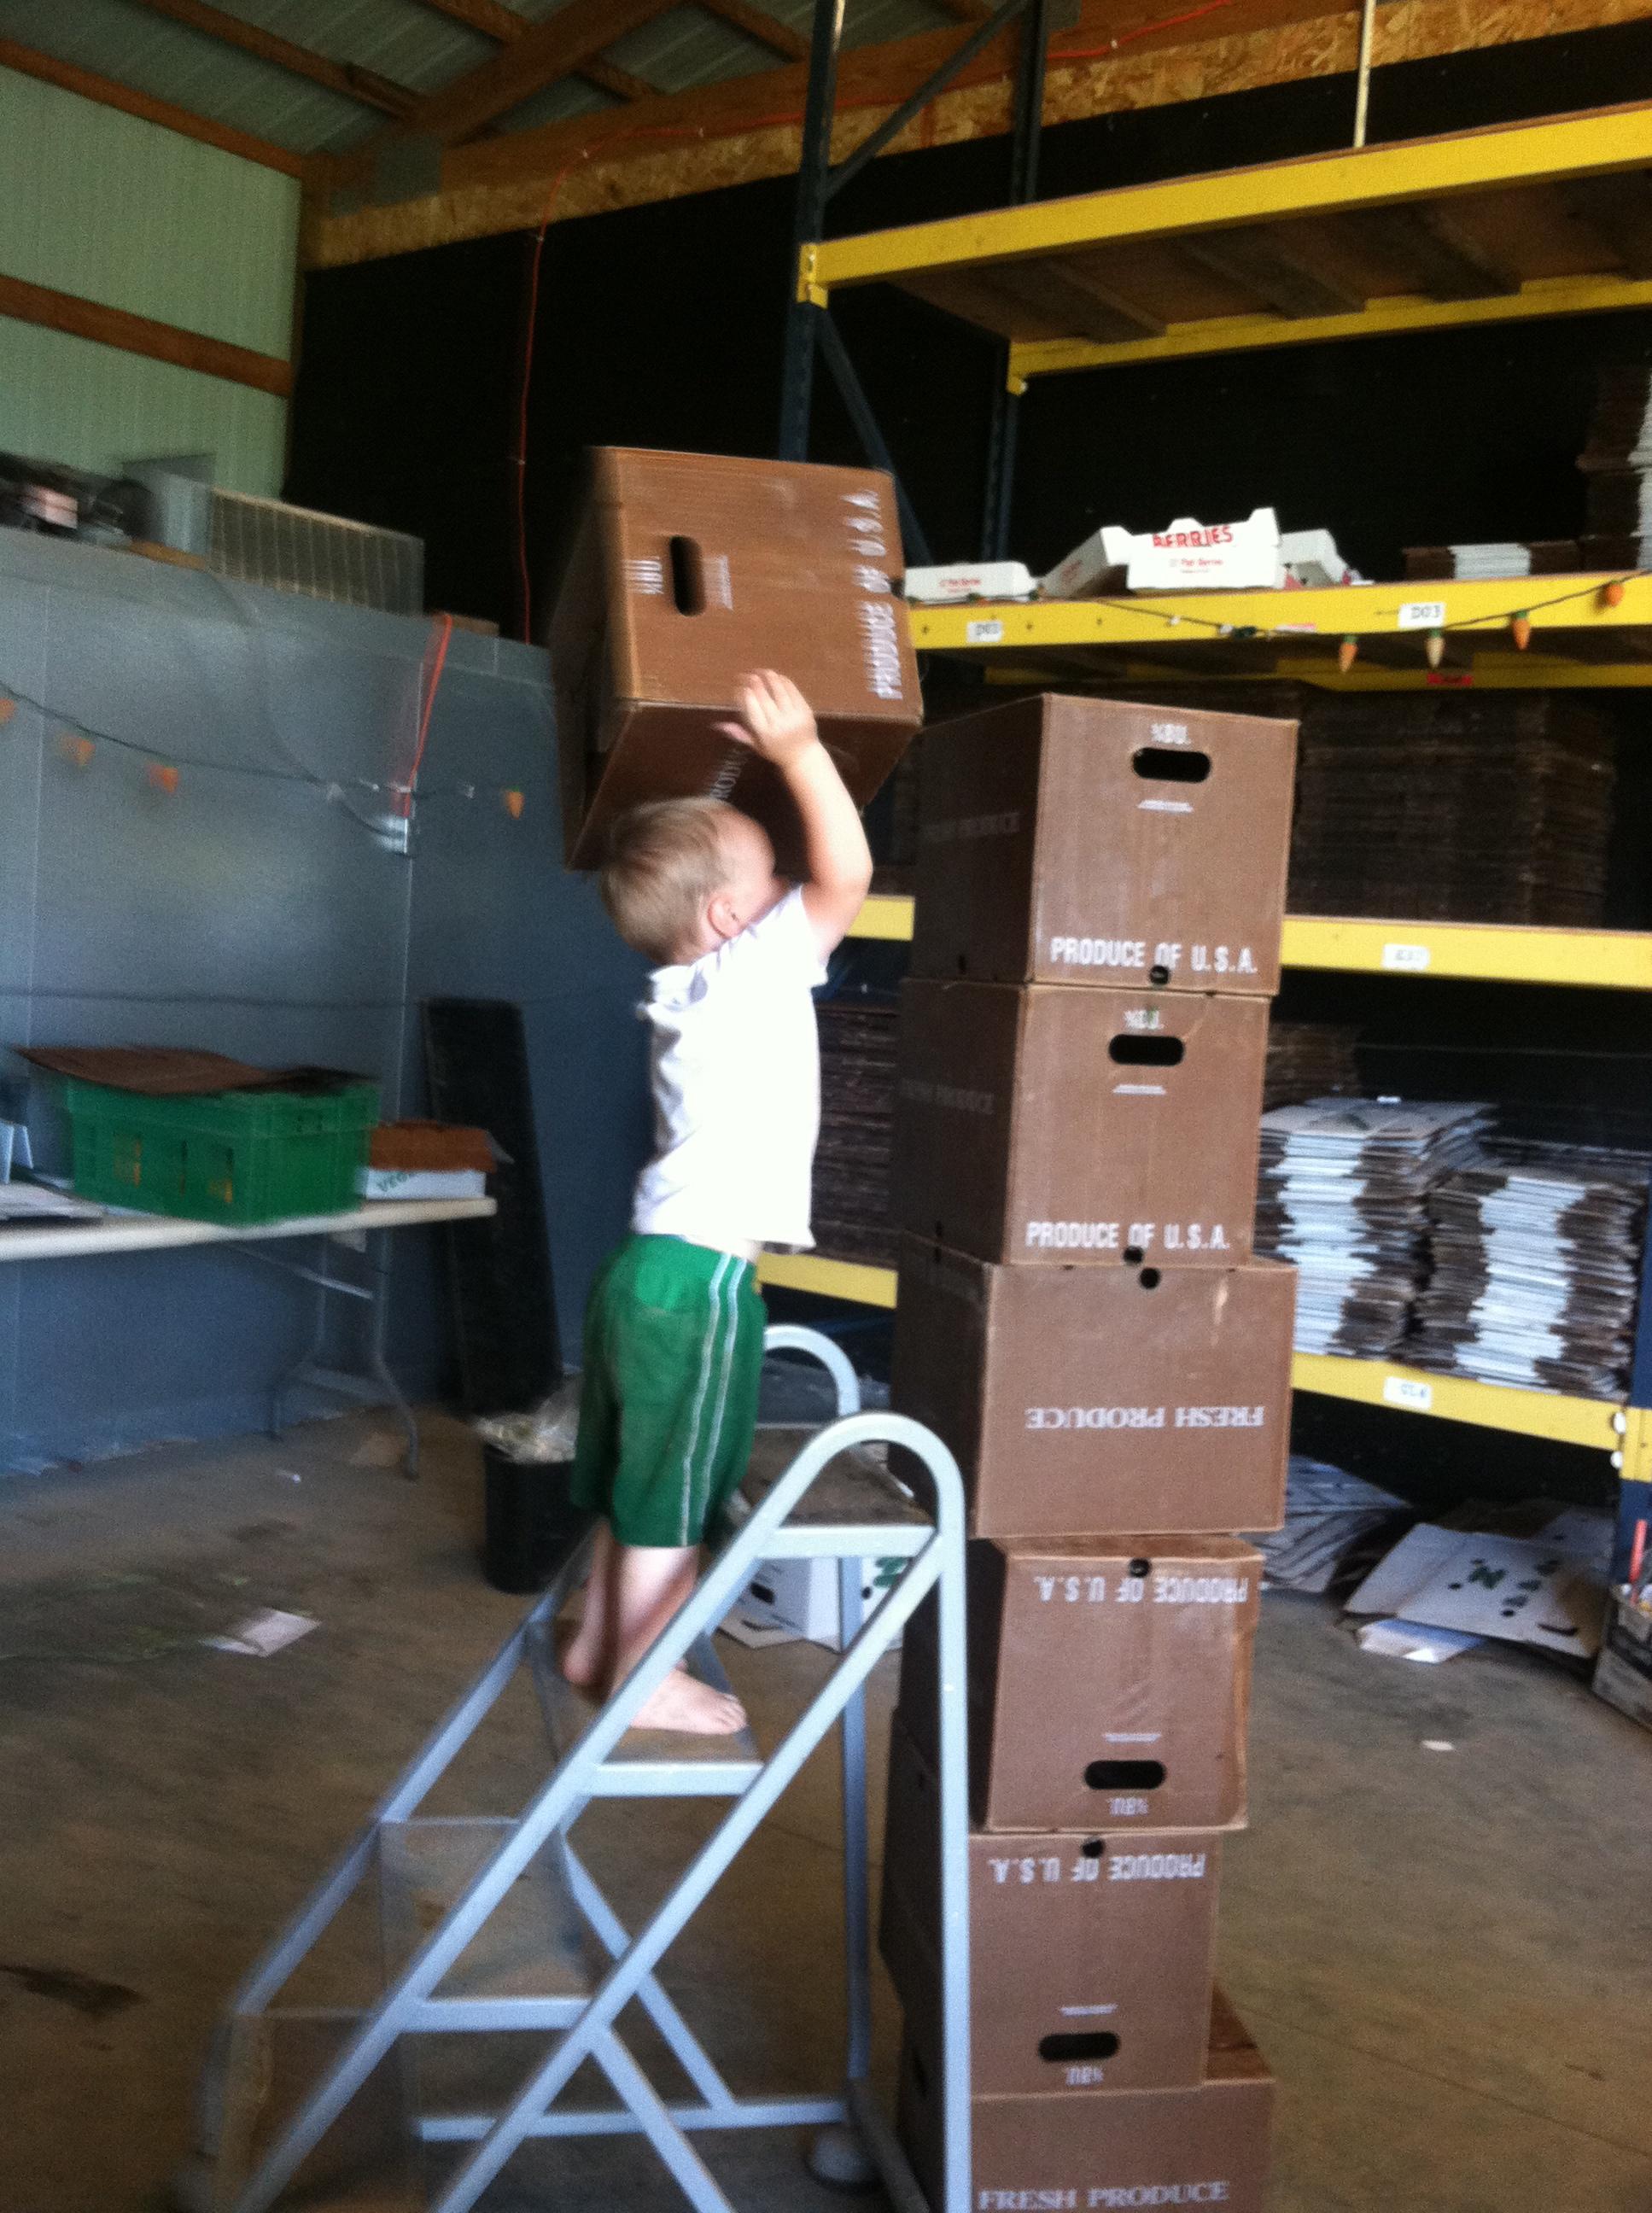 farm kid building blocks